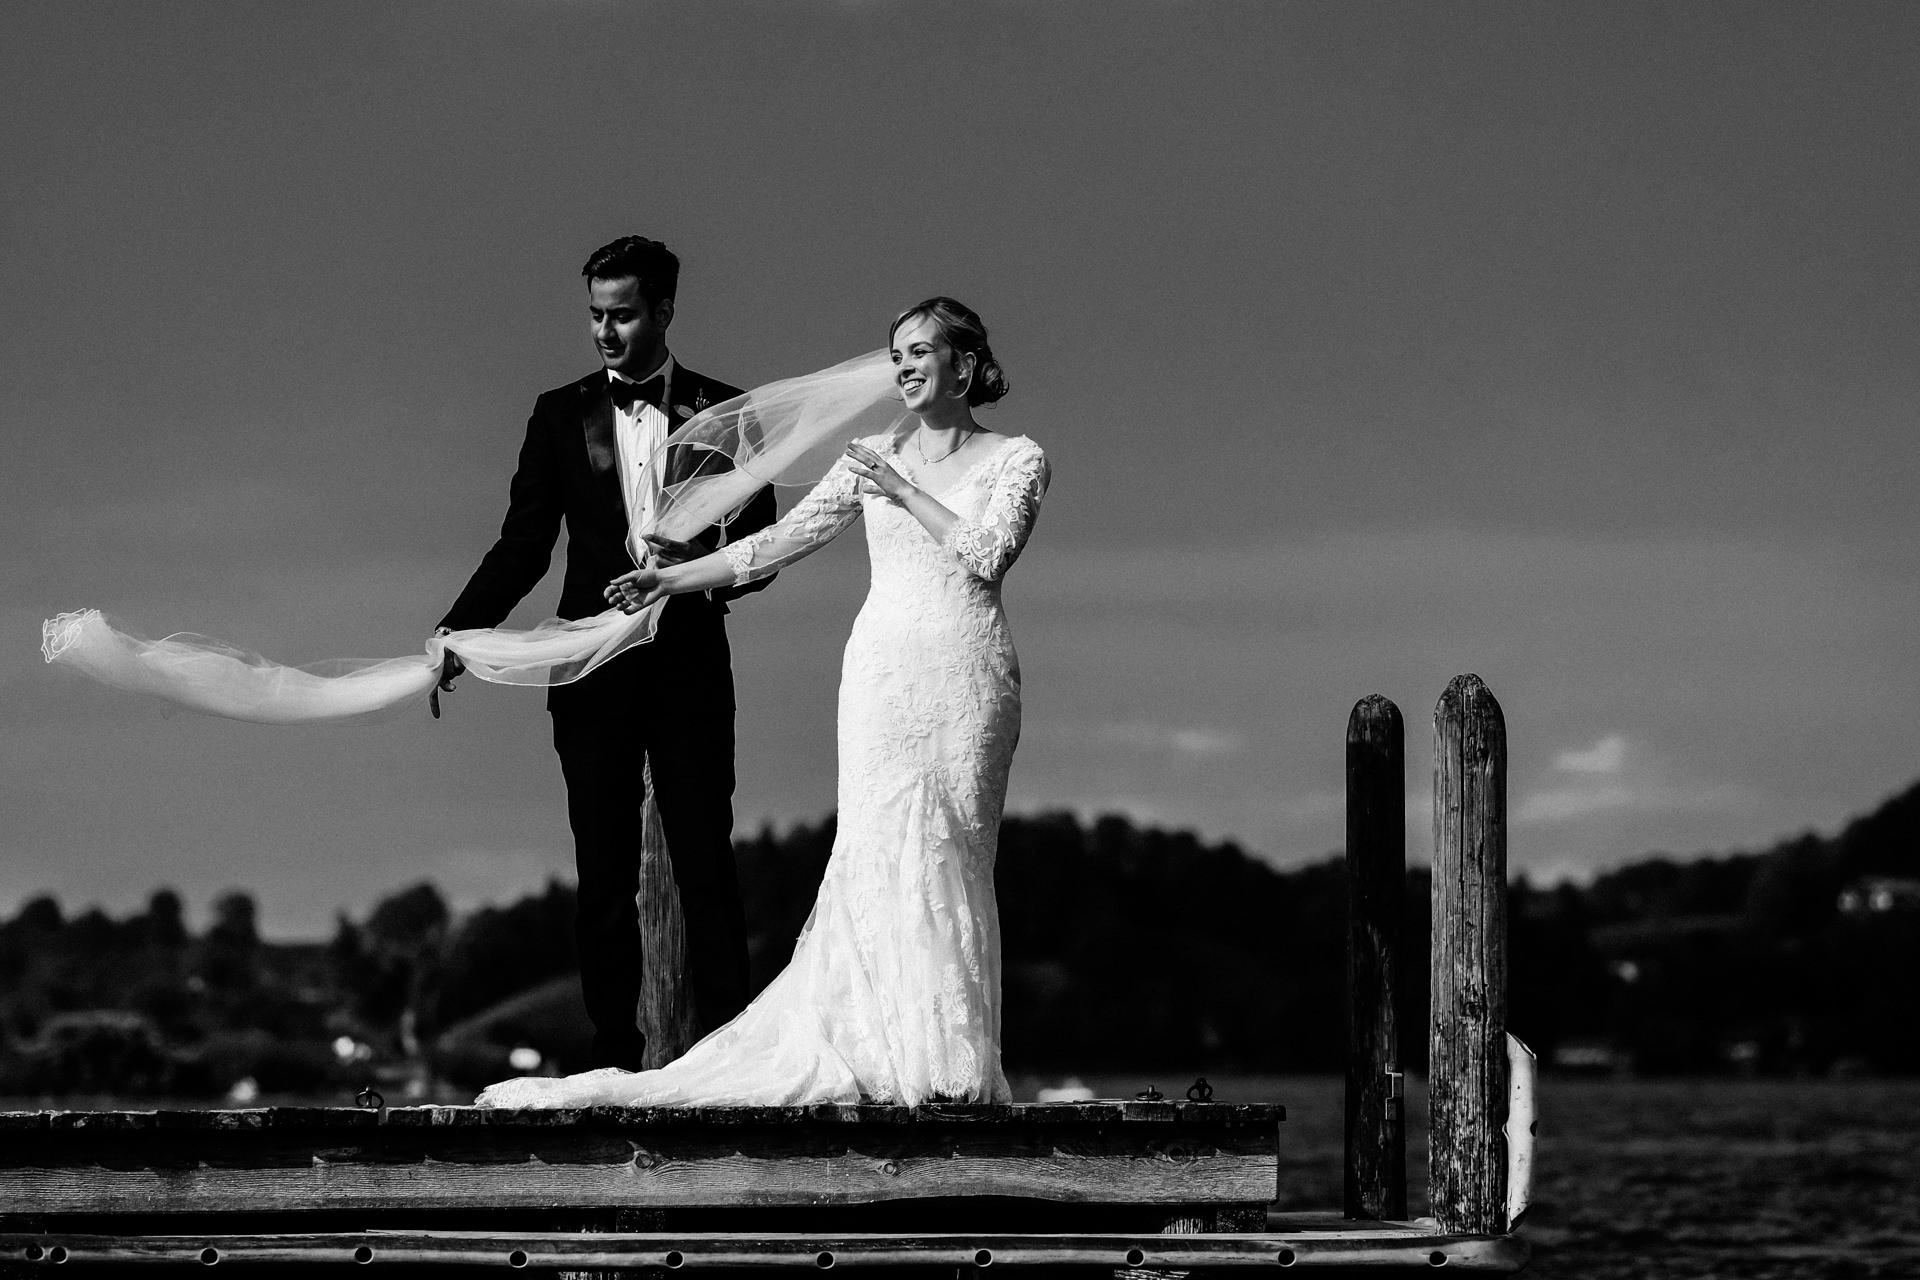 MUNICH-MULTICULTURAL-WEDDING-MOMENTICOS-ROCIO-VEGA029.jpg